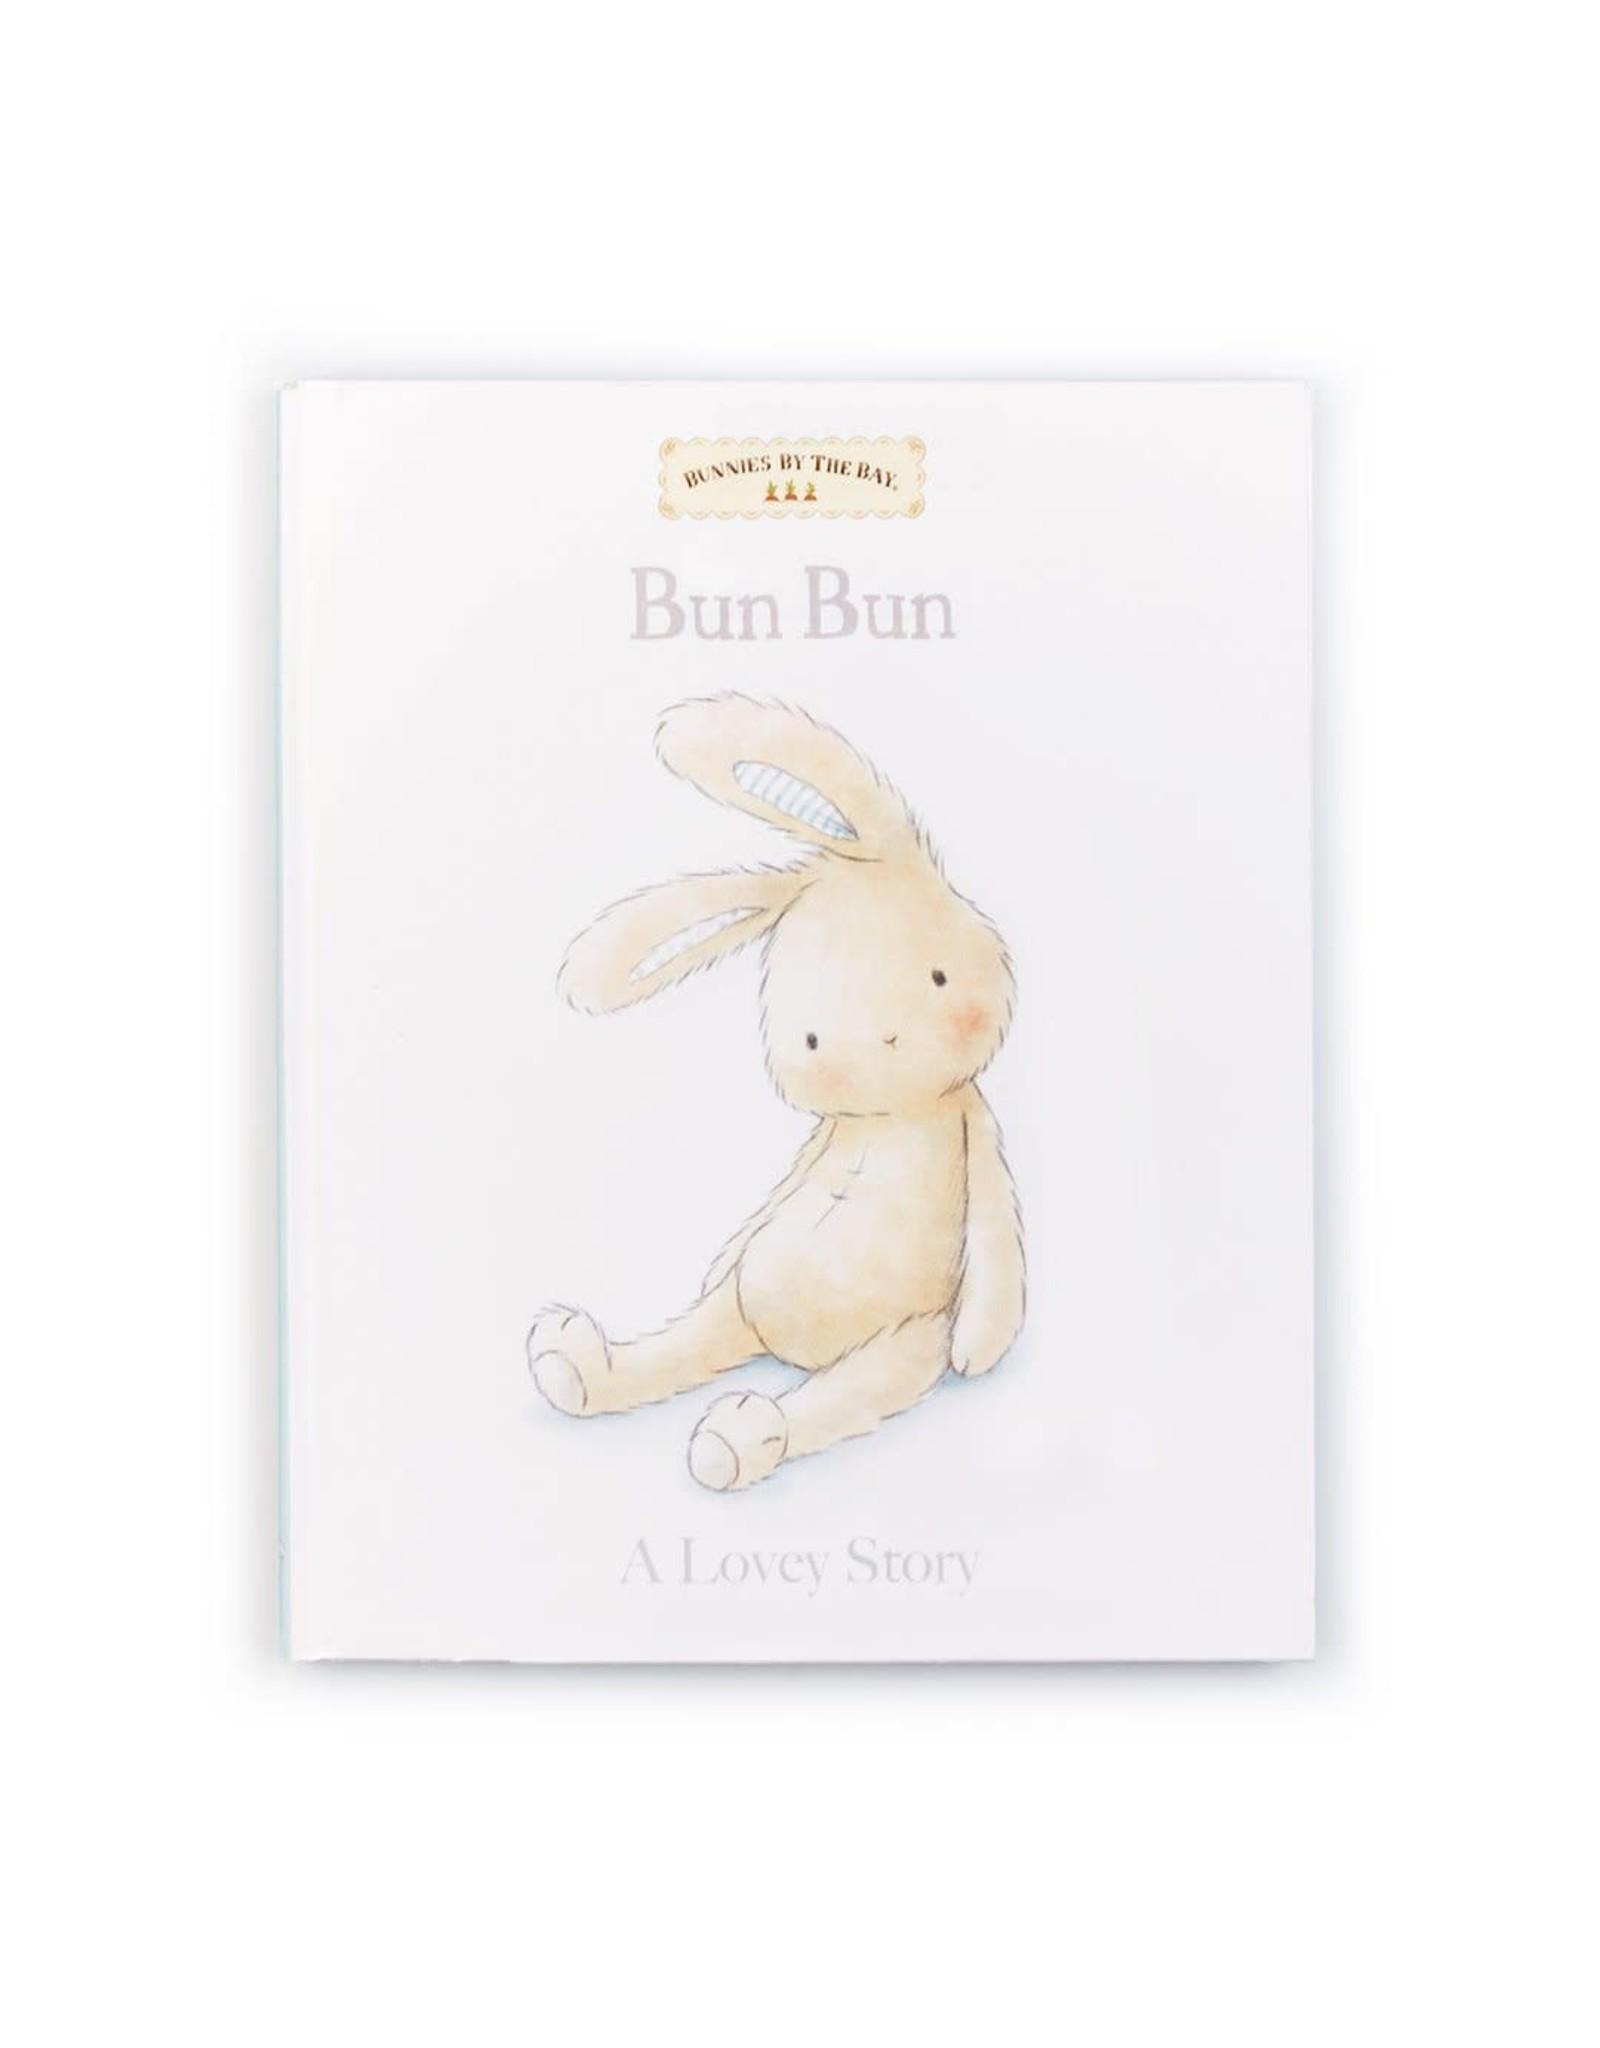 Bunnies by the Bay Bun Bun A Love Story Book